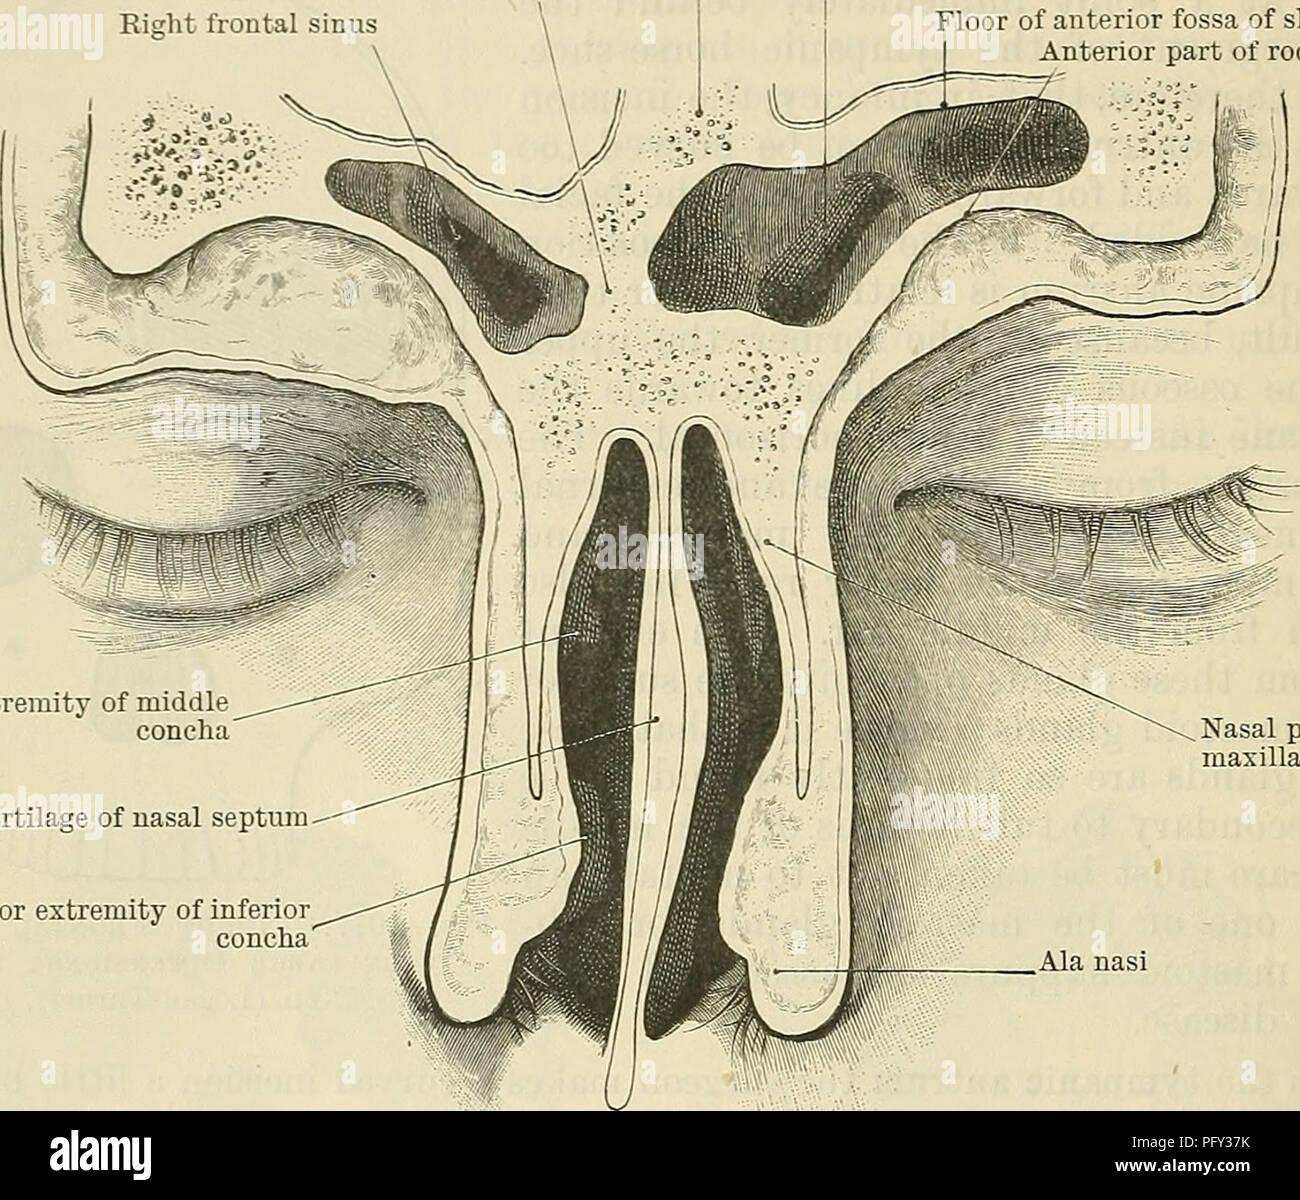 Frontal Sinus Stock Photos & Frontal Sinus Stock Images - Alamy